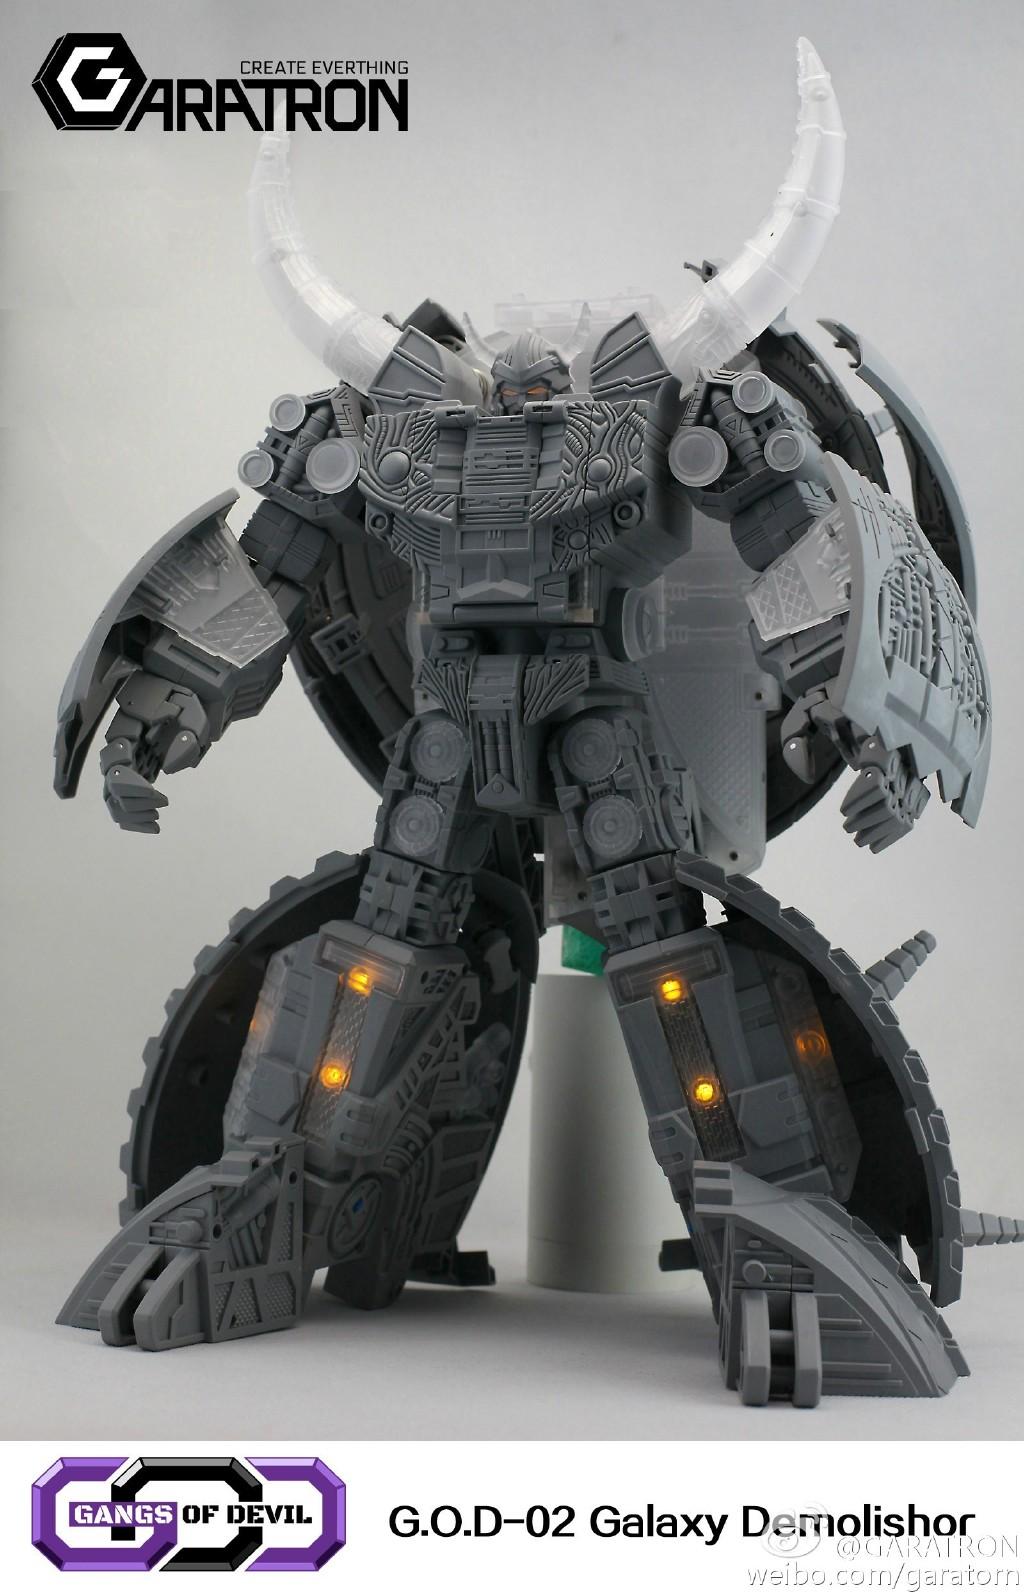 [Garatron] Produit Tiers - Gangs Of Devils G.O.D-02 Galaxy Demolishor - aka Unicron (Beast Wars Neo) Uni2